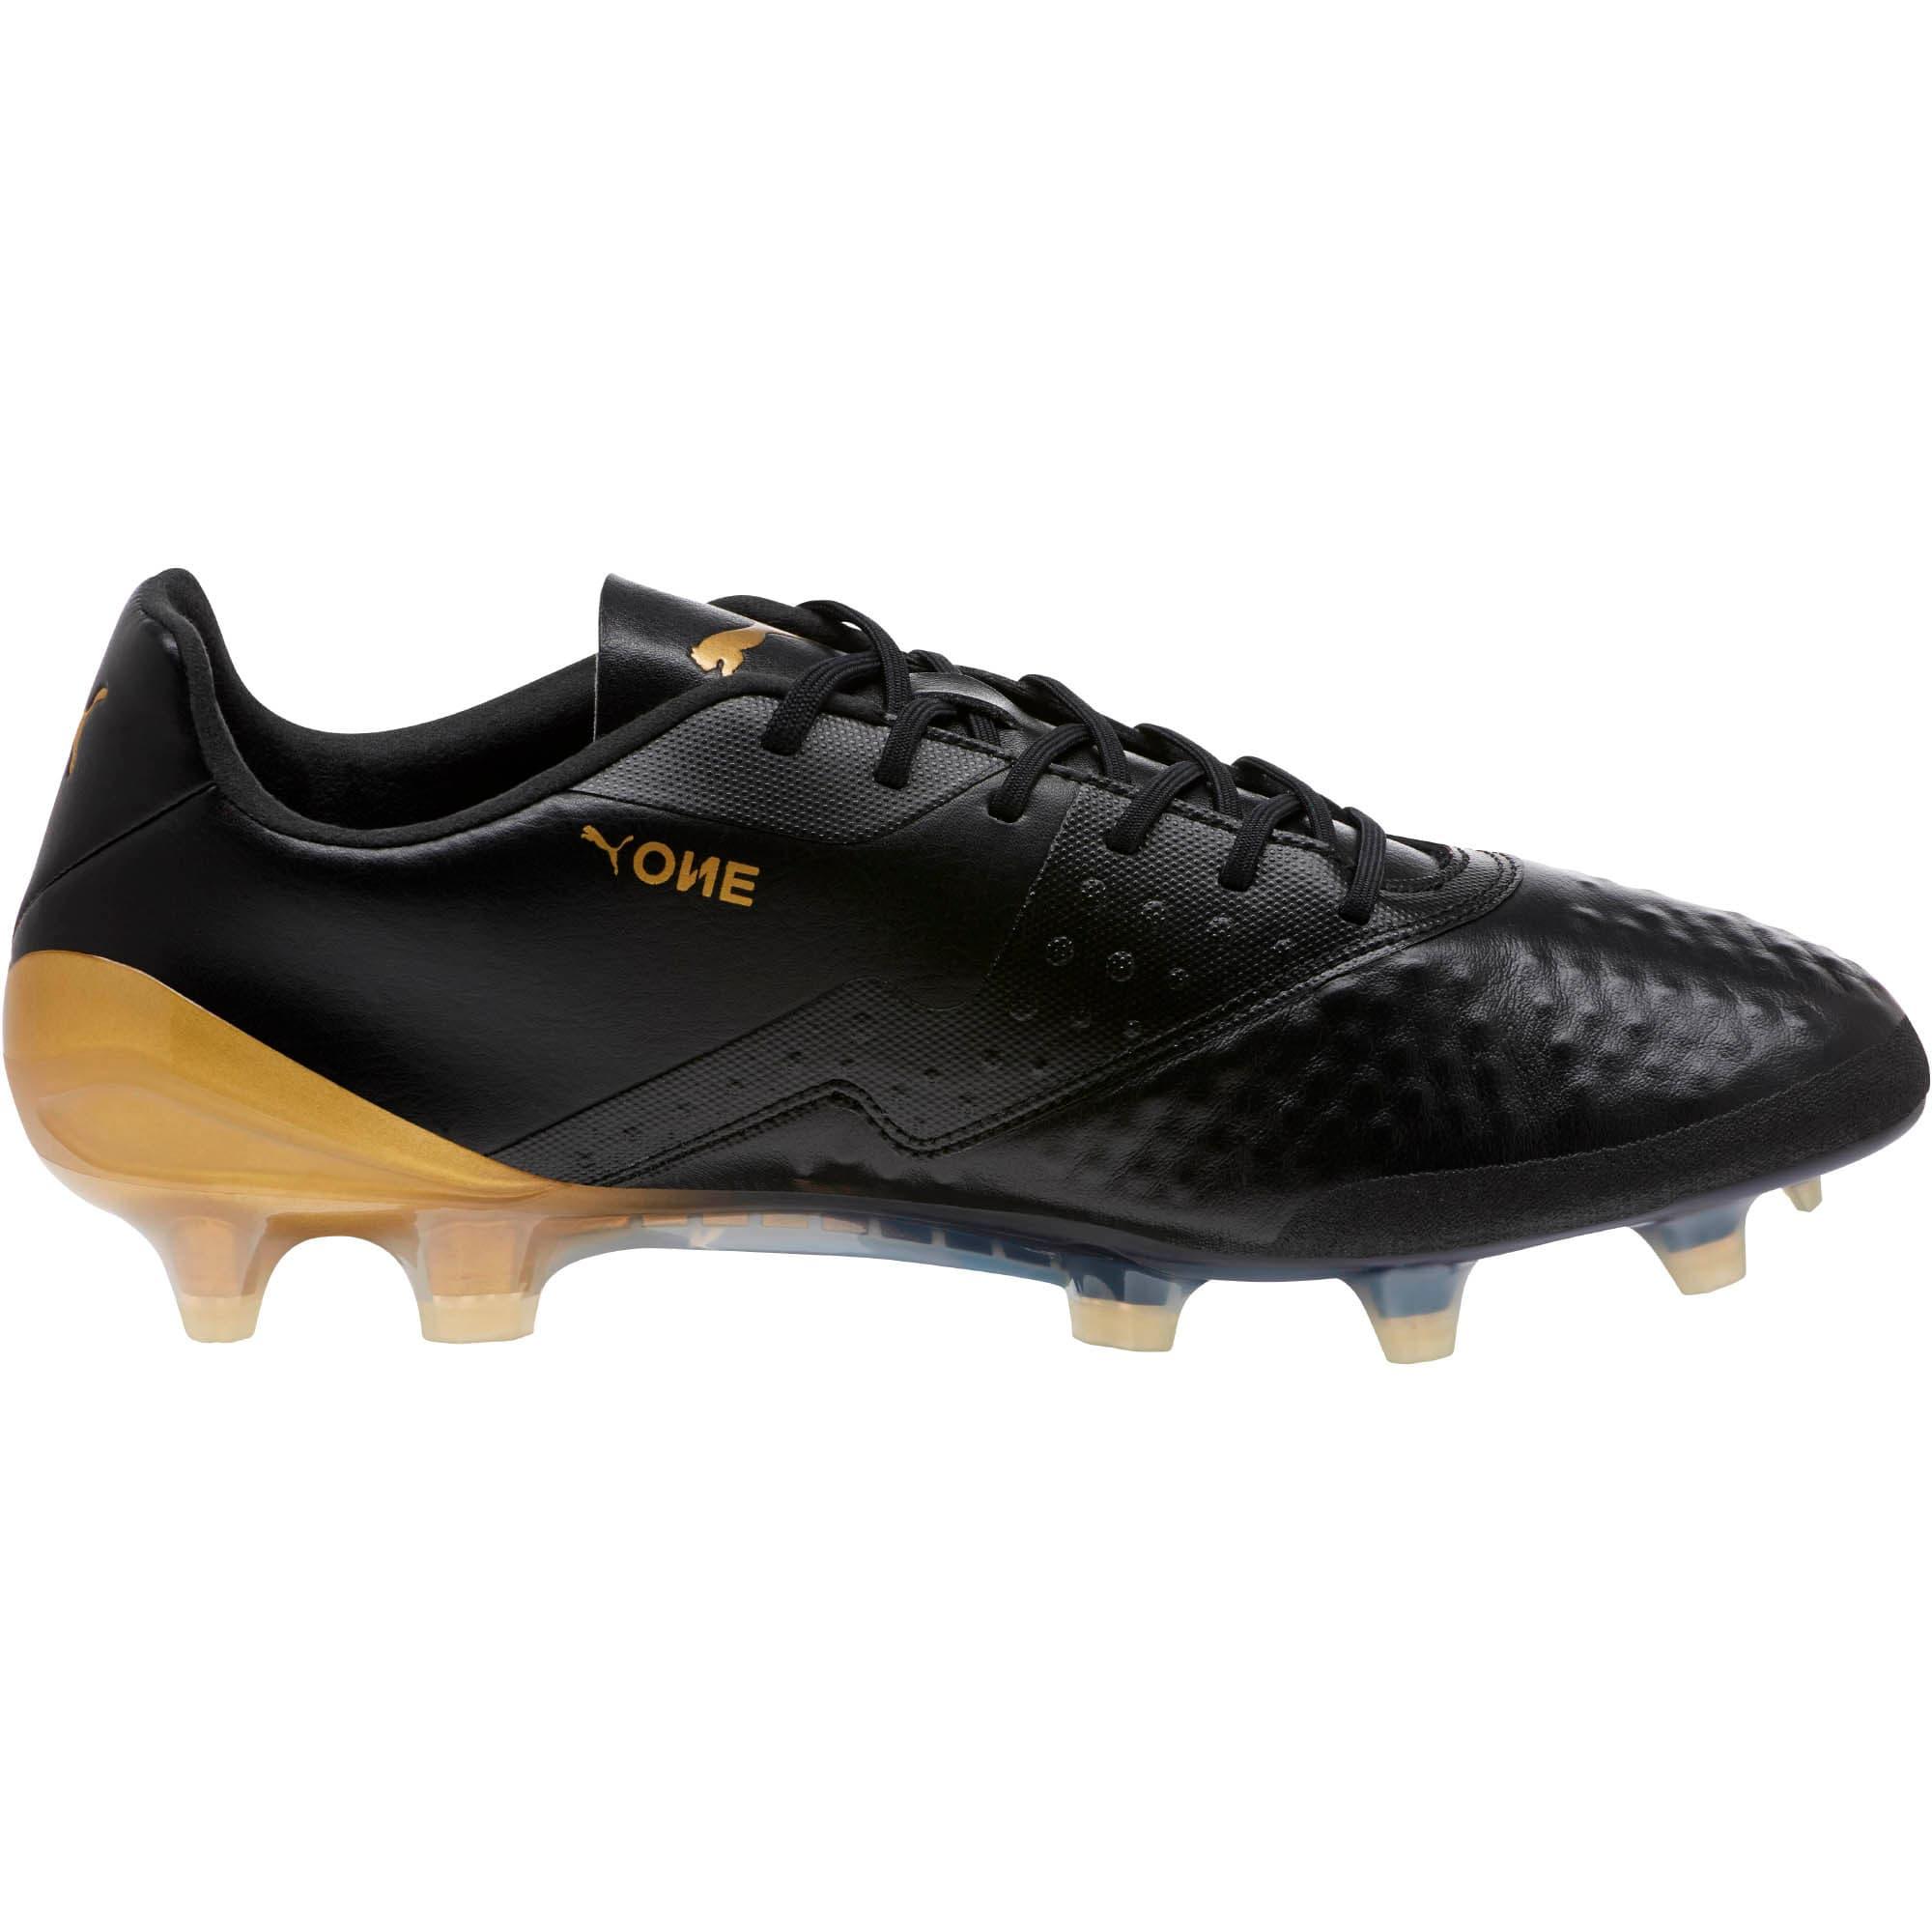 Thumbnail 3 of PUMA ONE 19.1 FG/AG Soccer Cleats, Black-White-Gold, medium